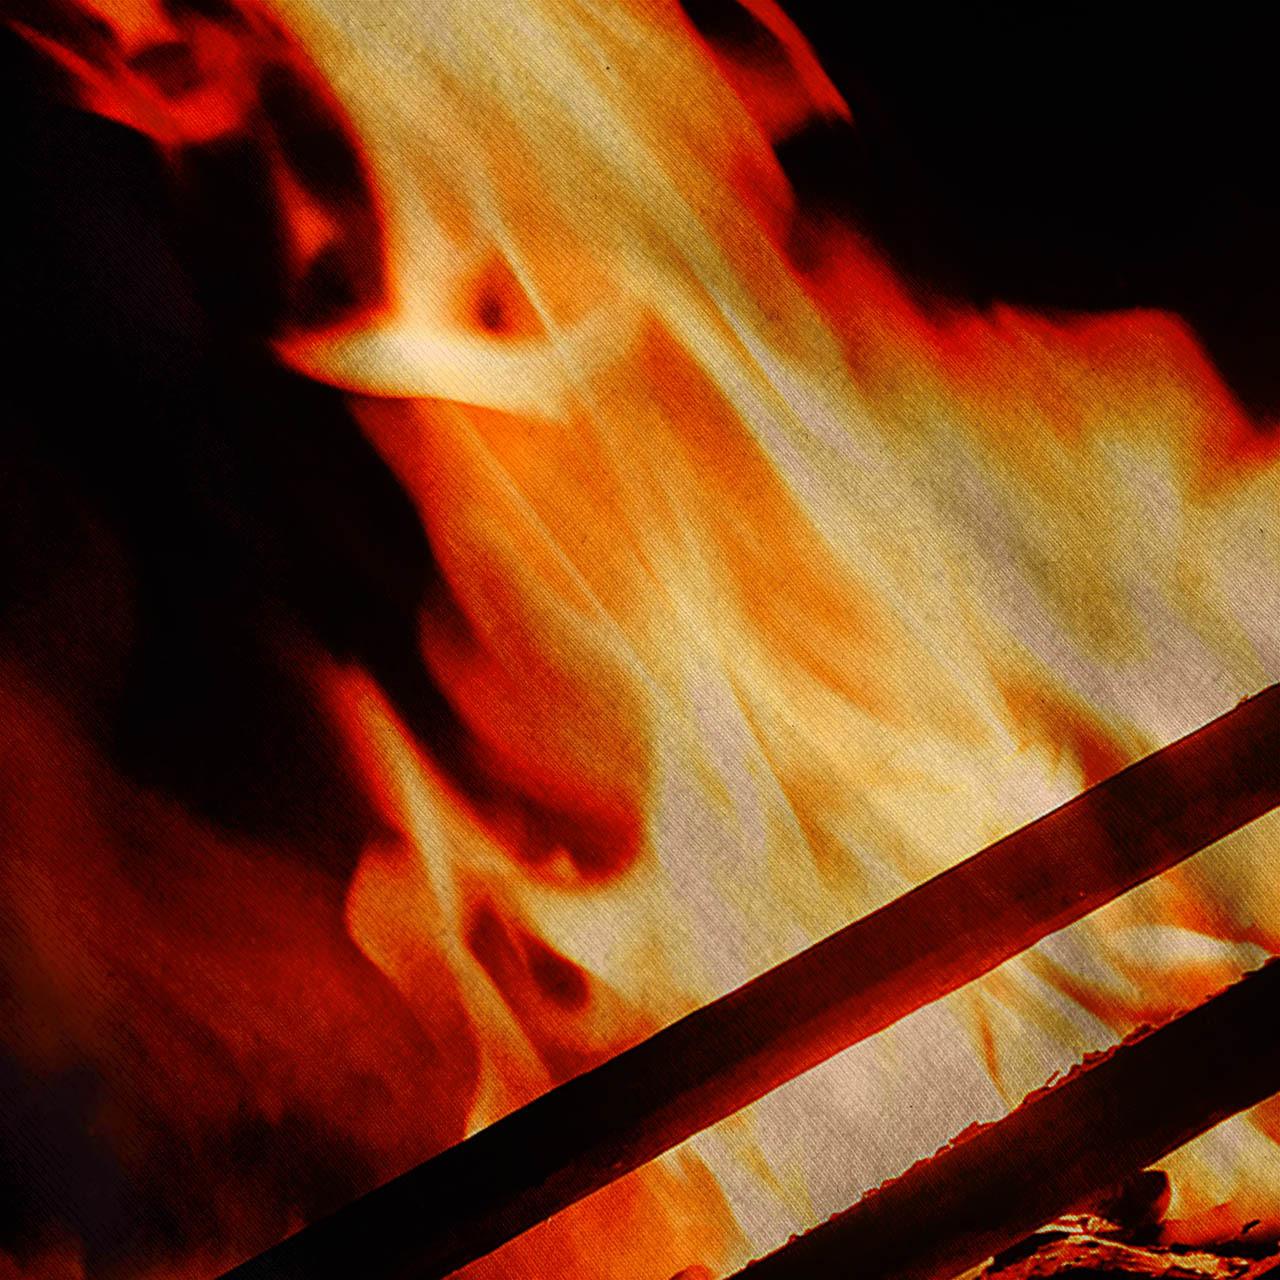 Burning Fireplace Tee Cozy House Women Tank Top